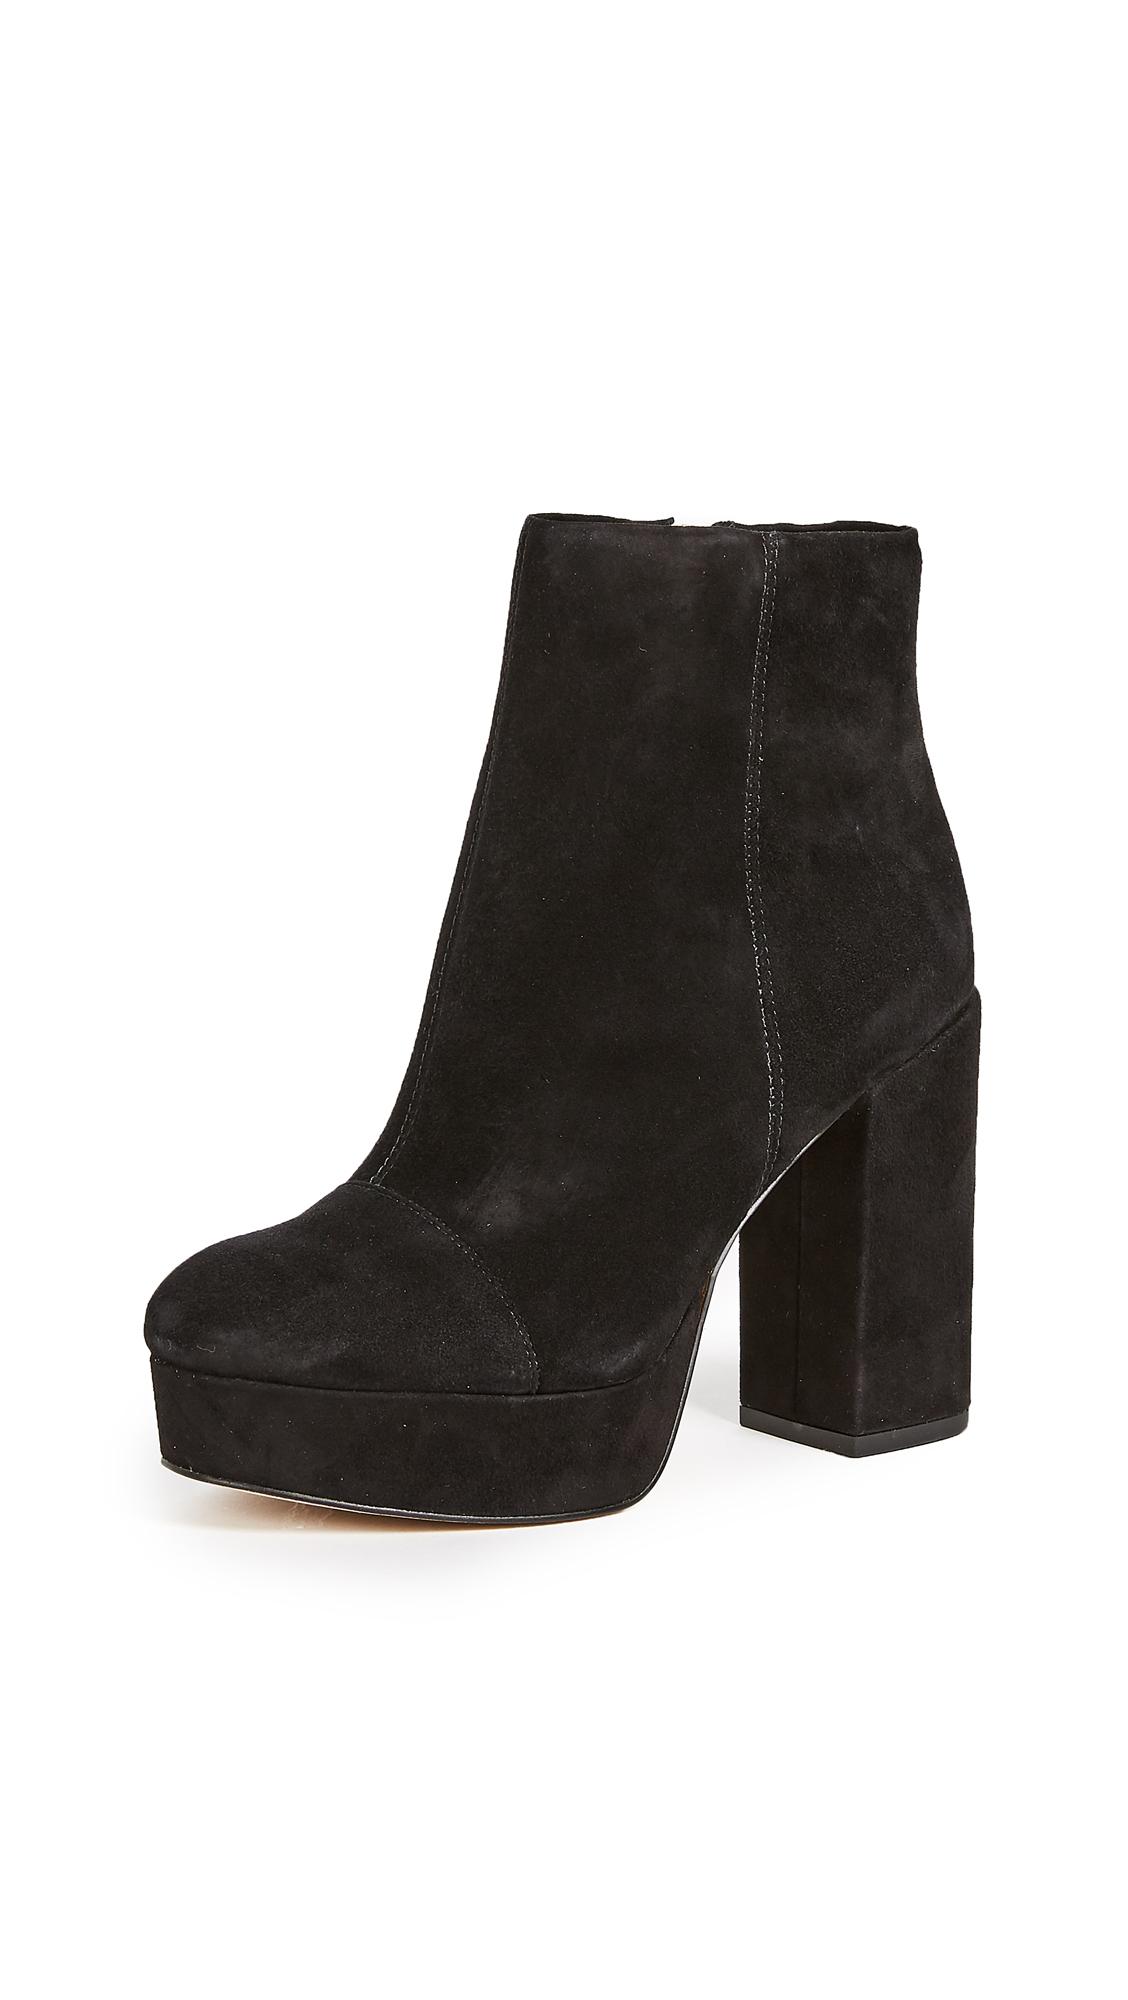 Photo of Sam Edelman Azra Platform Booties - buy Sam Edelman shoes